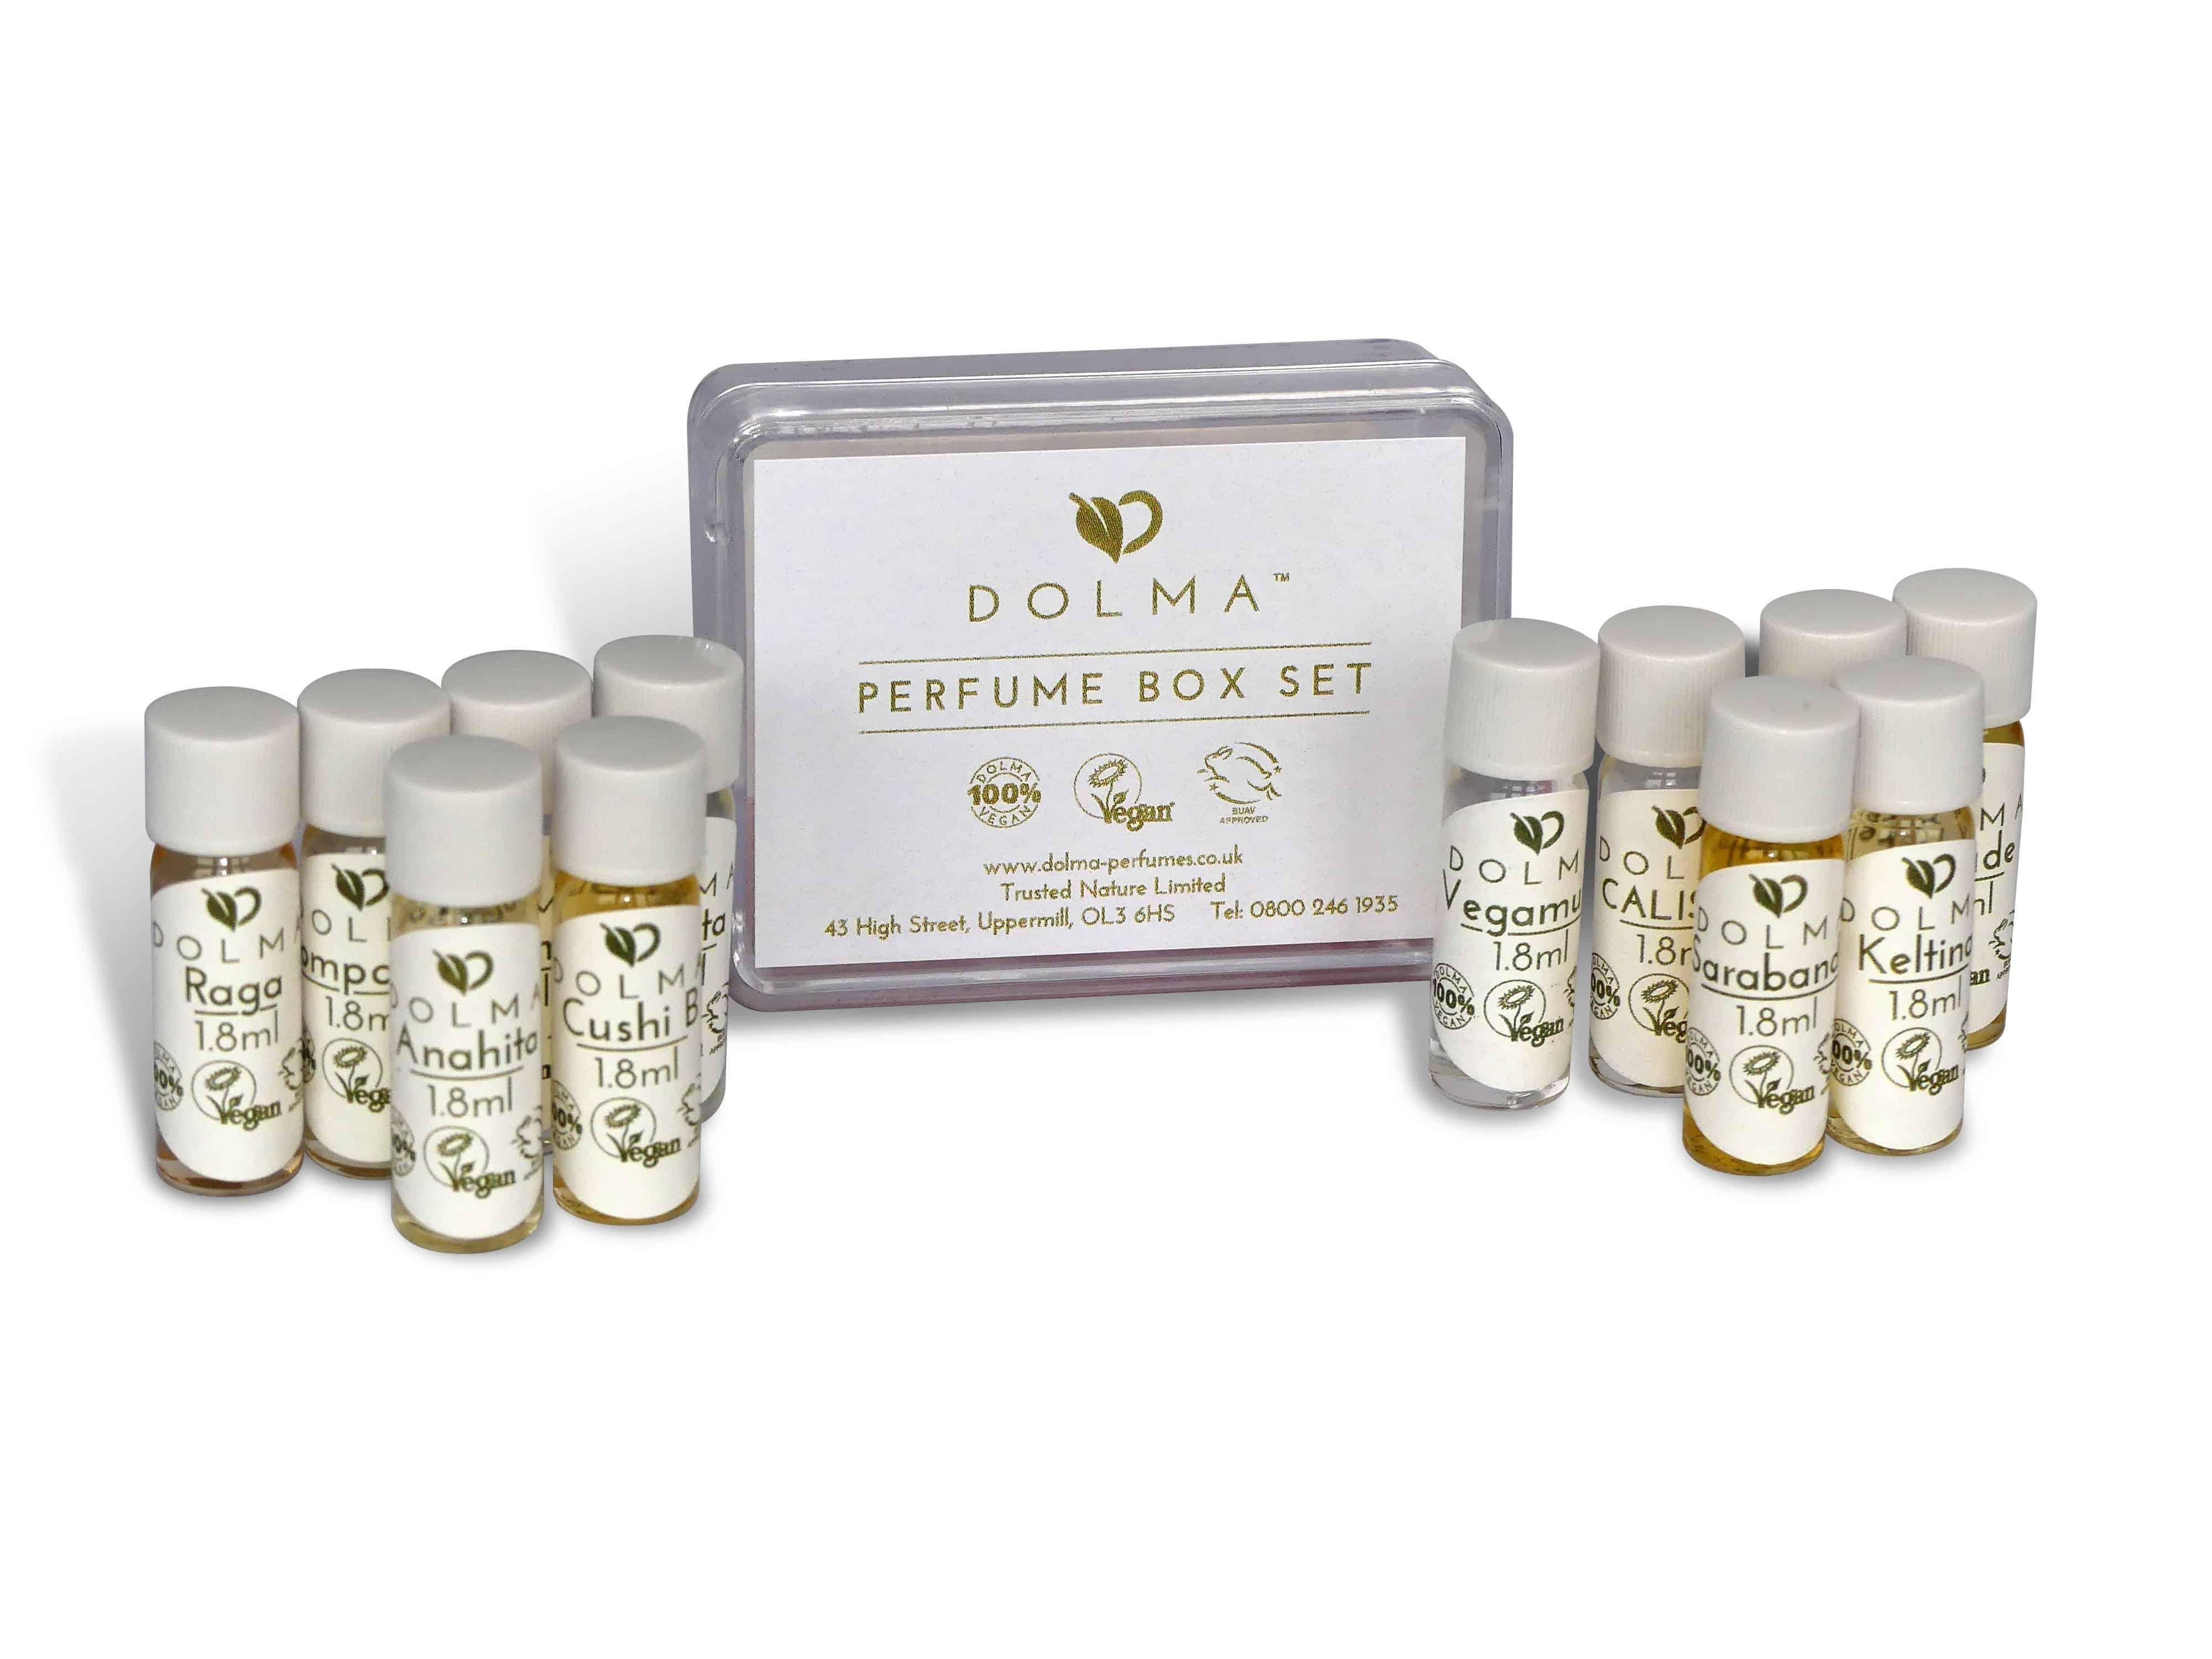 vegan perfume box set